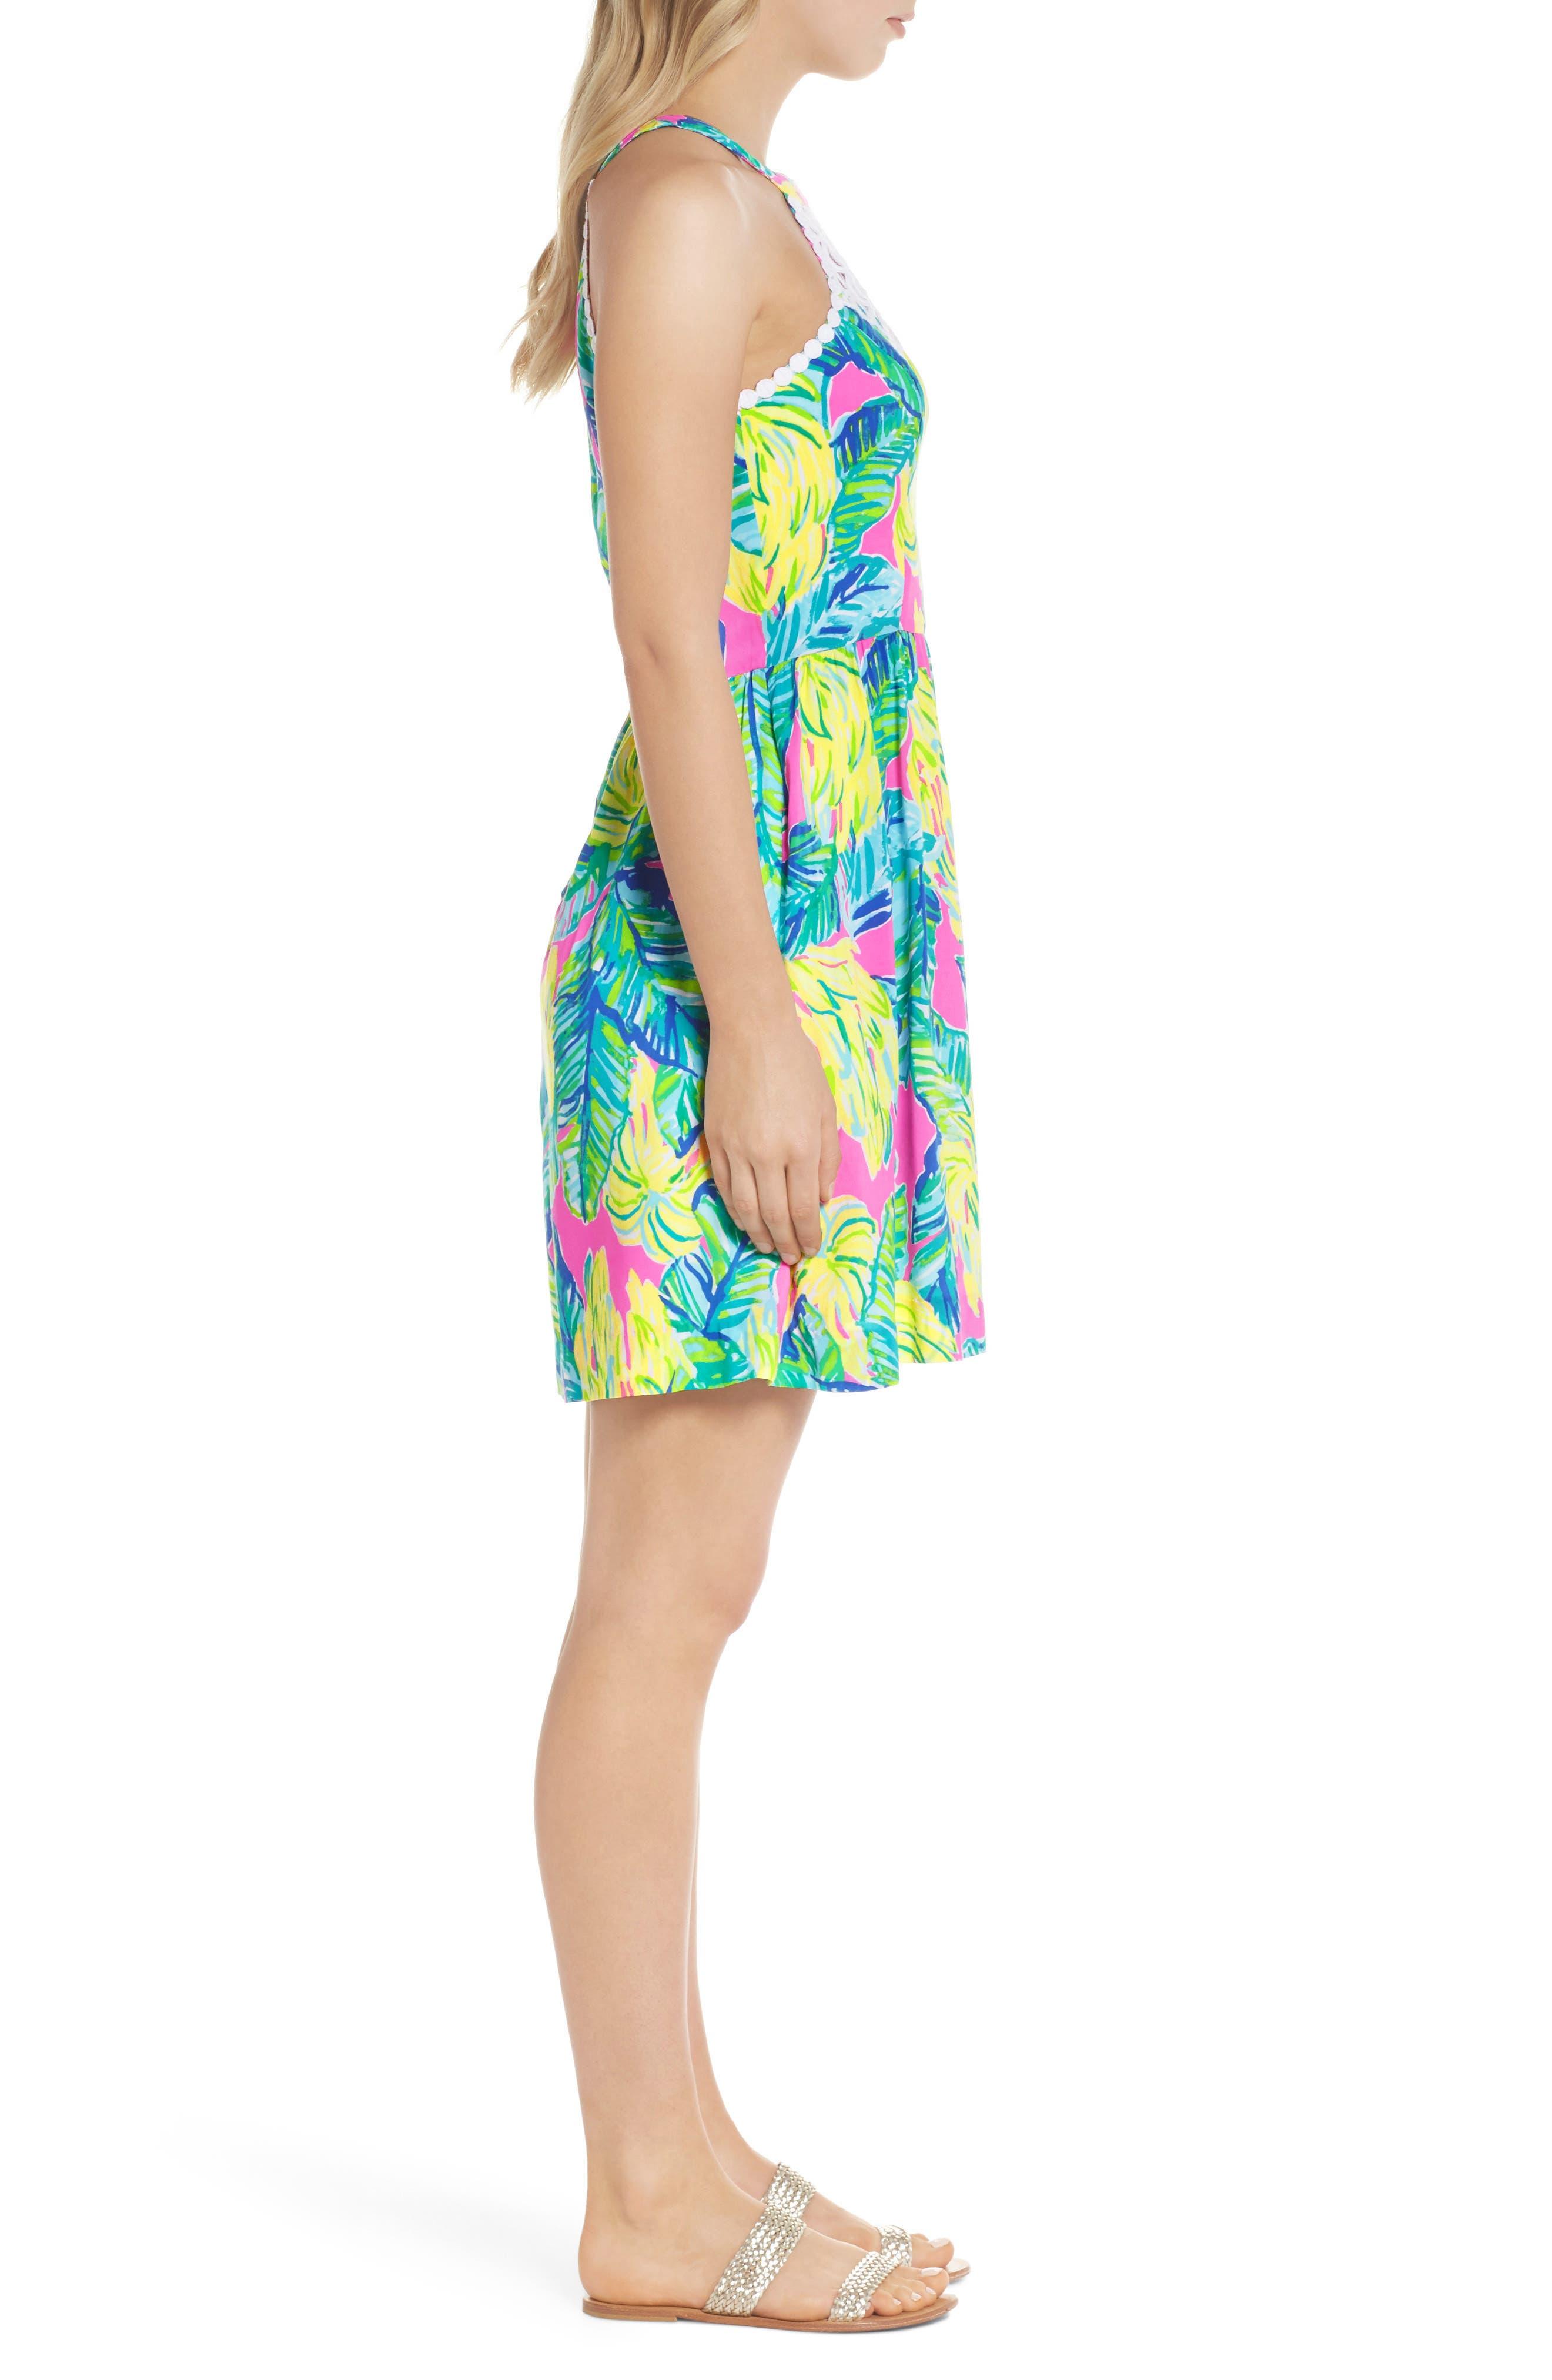 Kinley Halter Dress,                             Alternate thumbnail 3, color,                             PINK SUNSET LOCAL FLAVOR